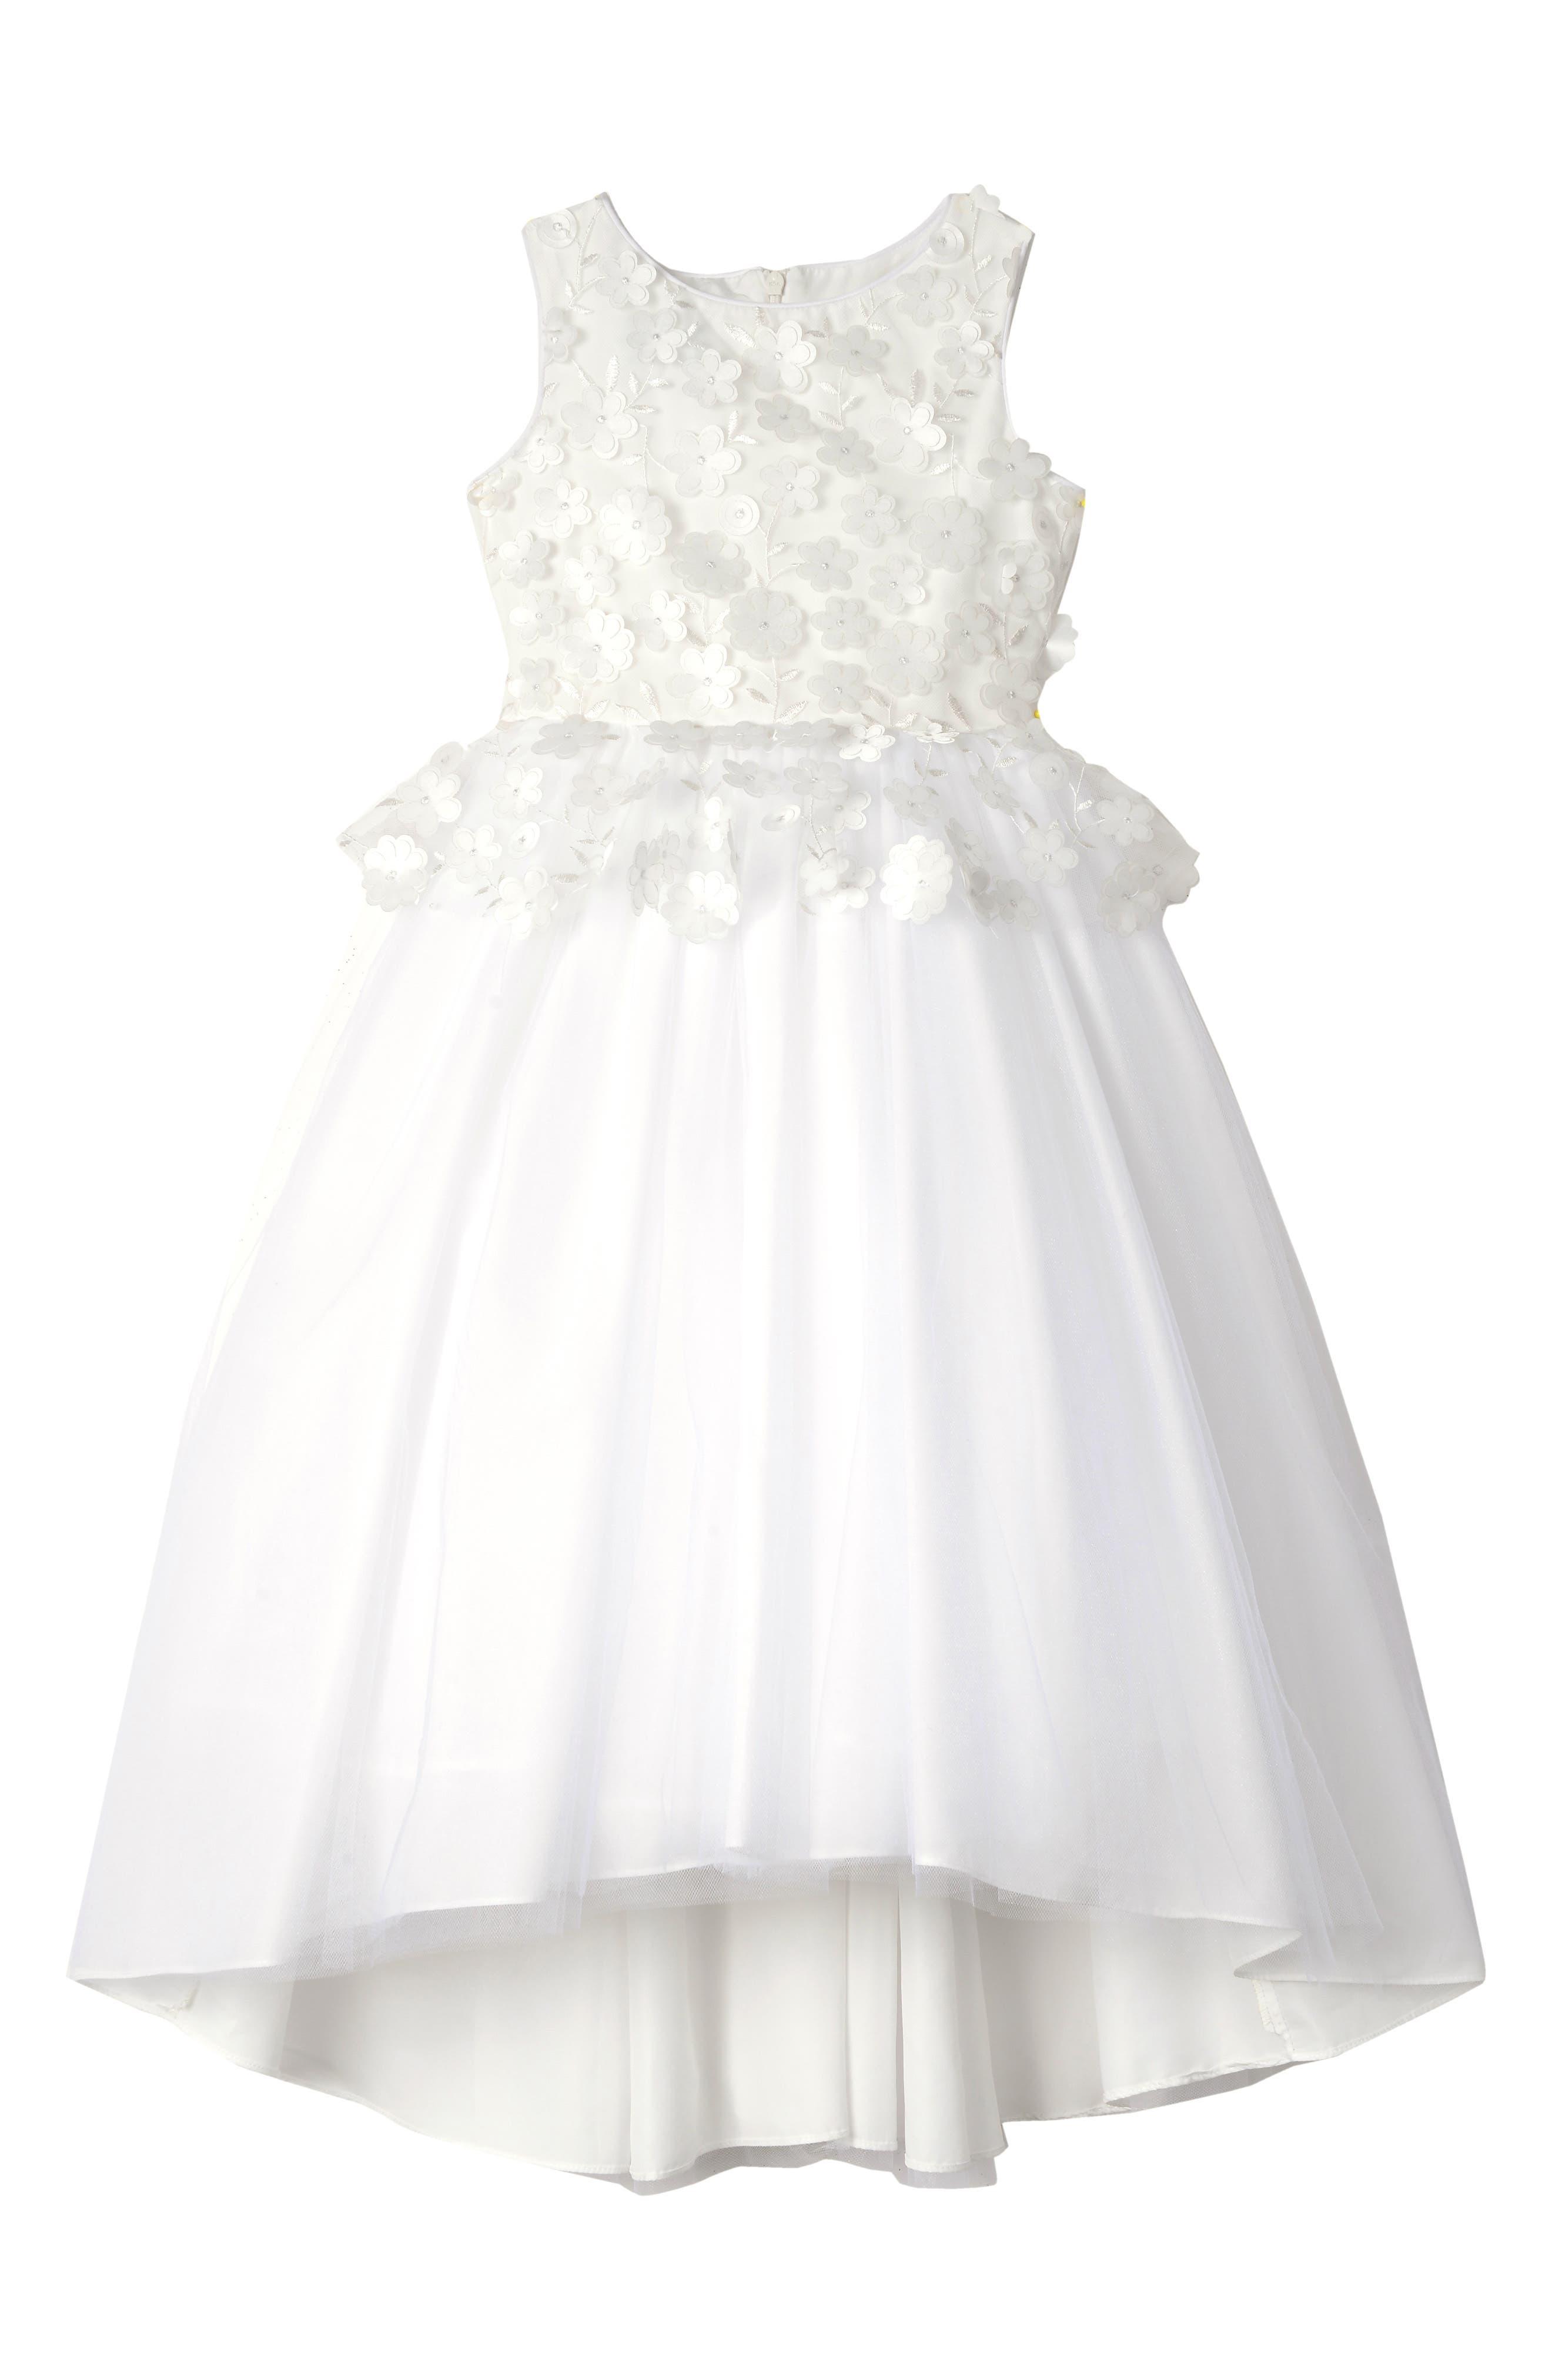 5858f4338fa5 Flower Girl Dresses   Accessories